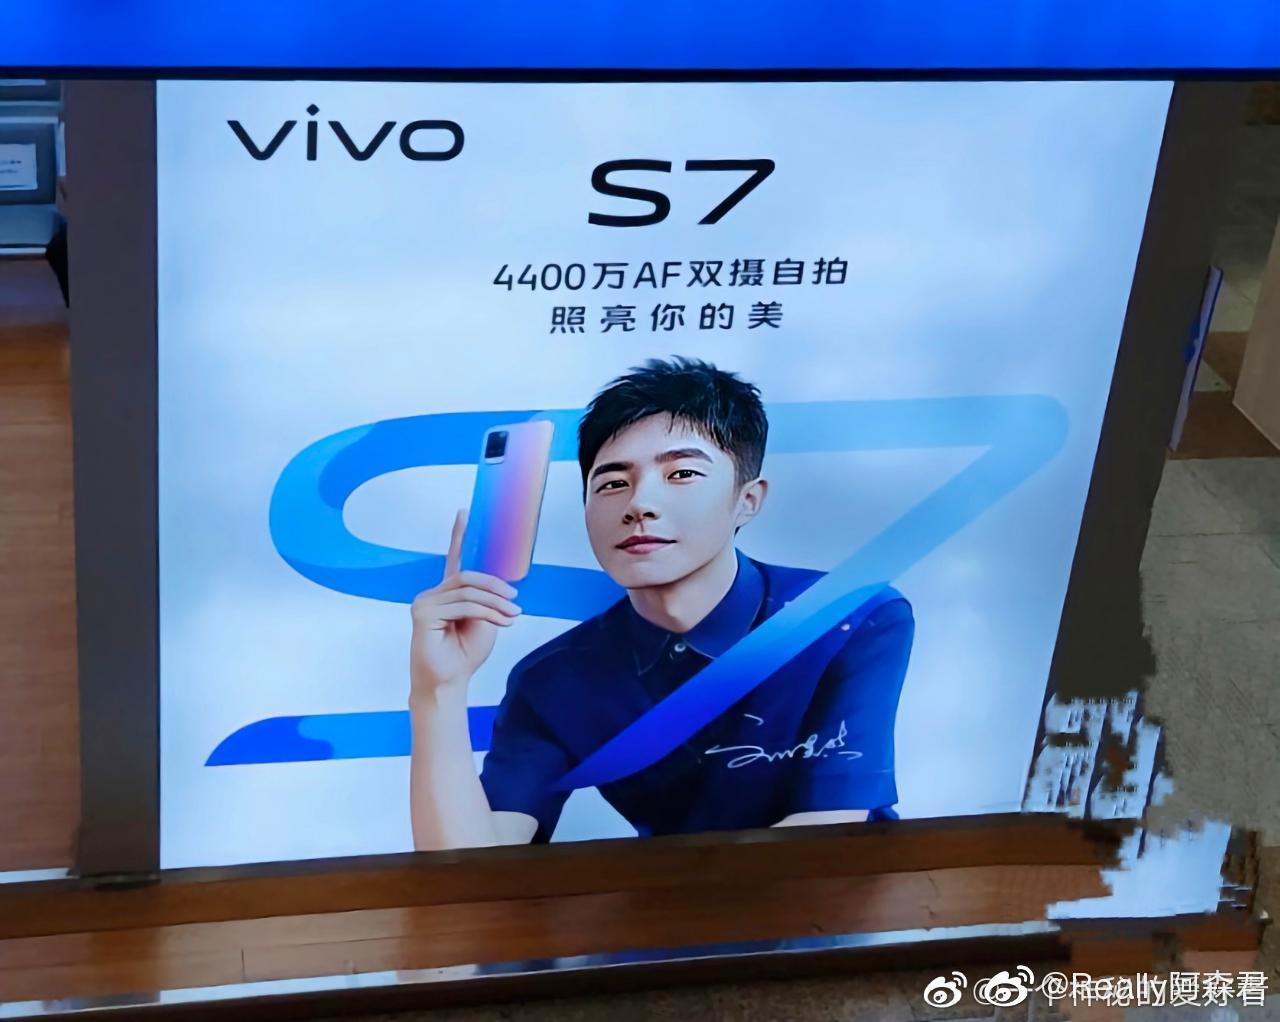 Рассекречена дата запуска и дизайн смартфона Vivo S7 5G (vivo s7 5g design leak 1)